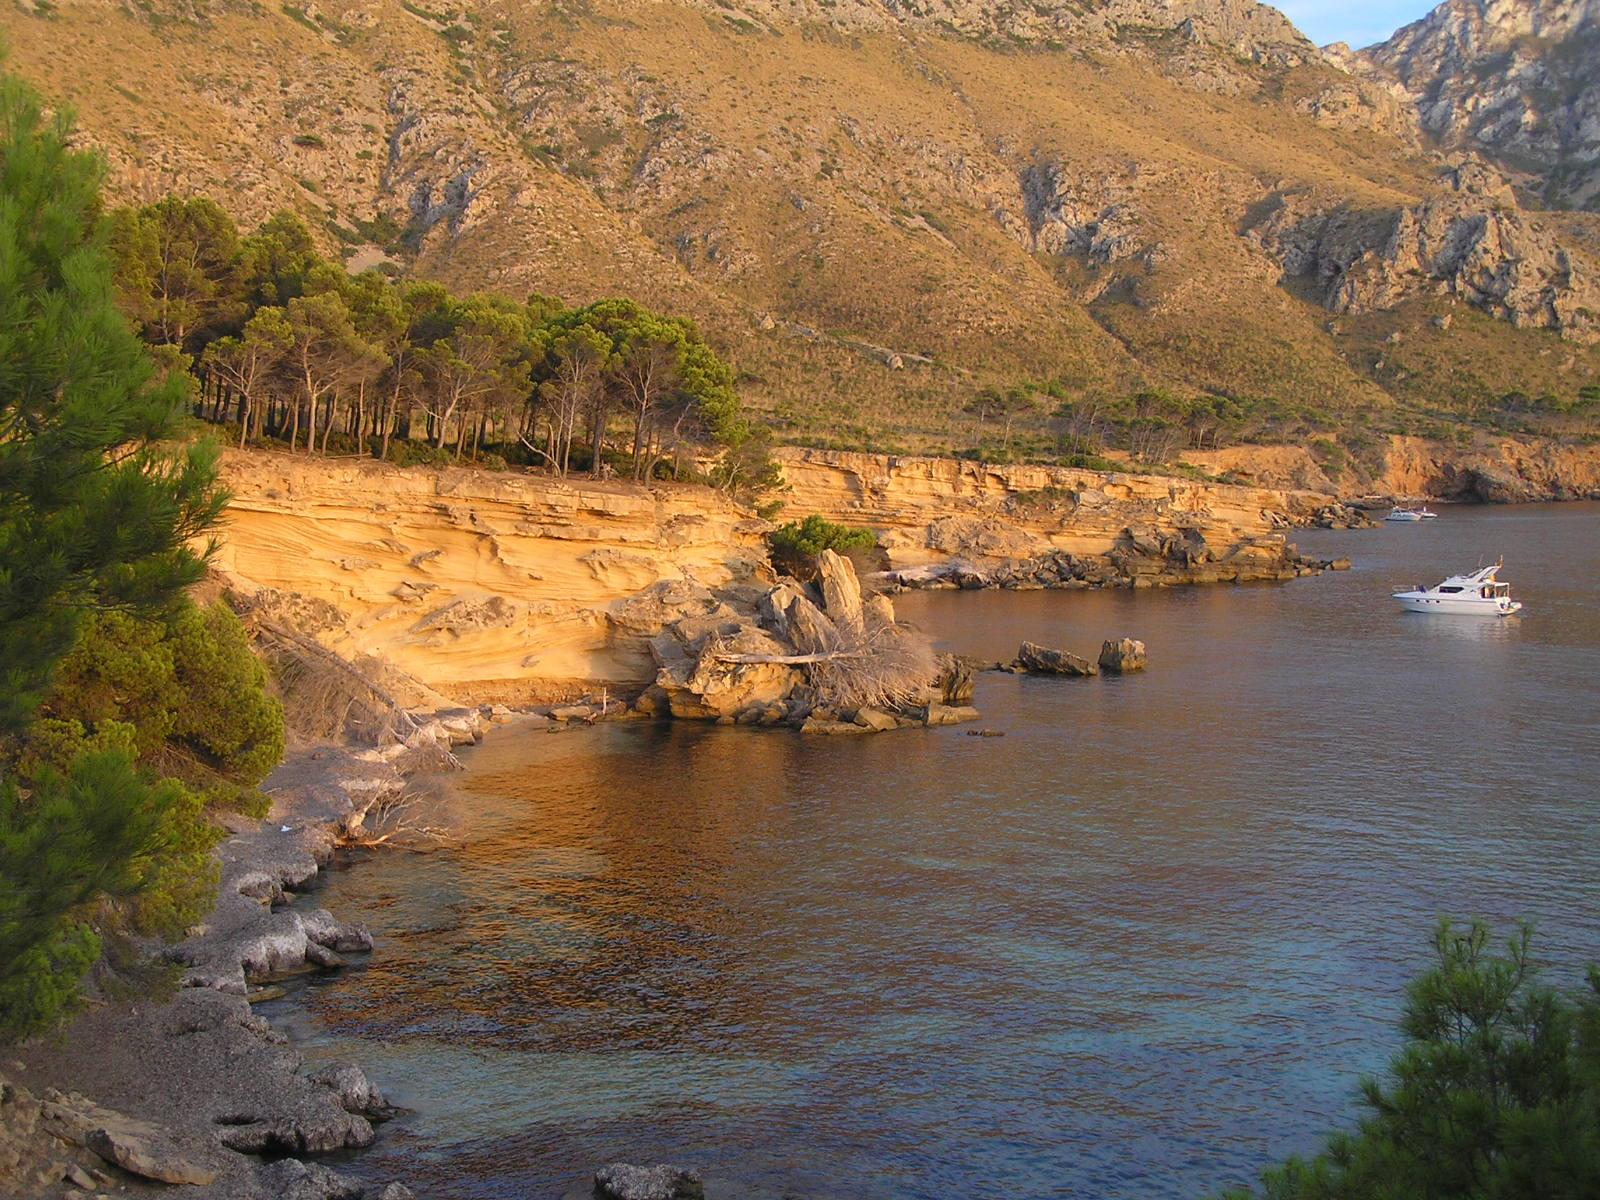 Foto playa Es Caló. Dunas fosiles de es Caló / Fossil sand dunes a Es Caló P8102898